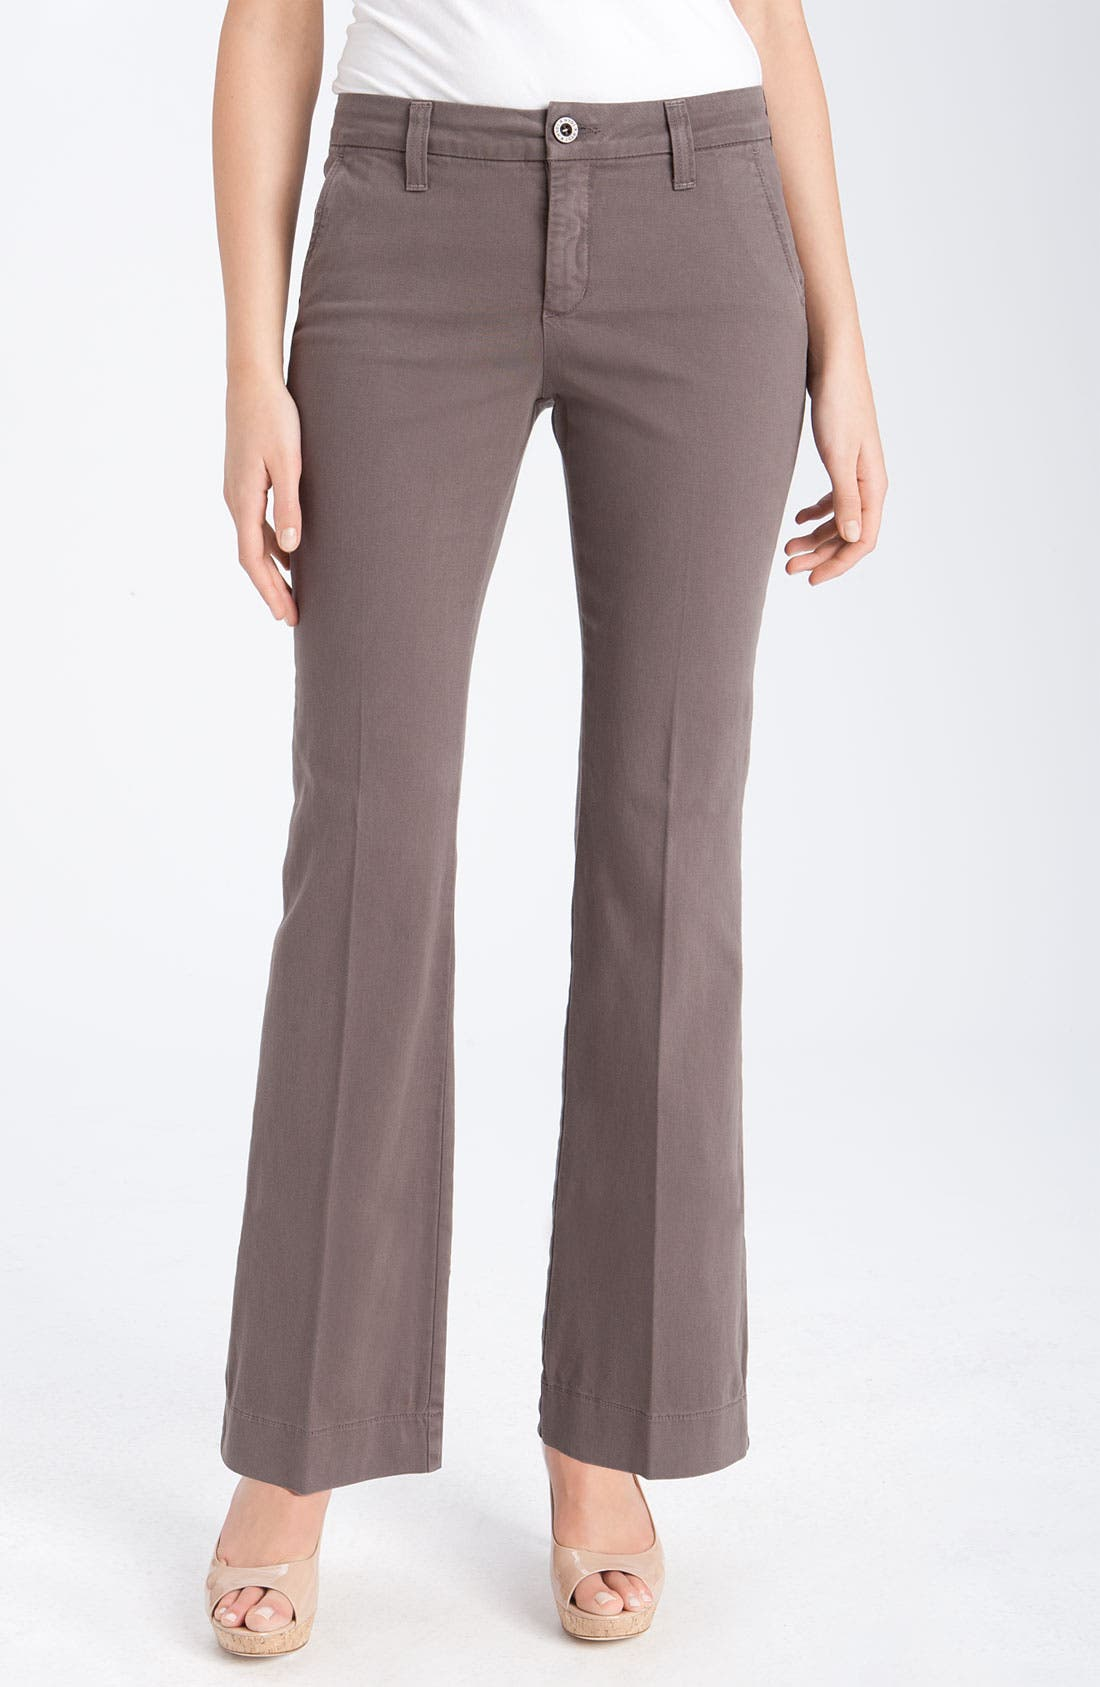 Main Image - NYDJ 'Vanessa' Stretch Trousers (Petite)